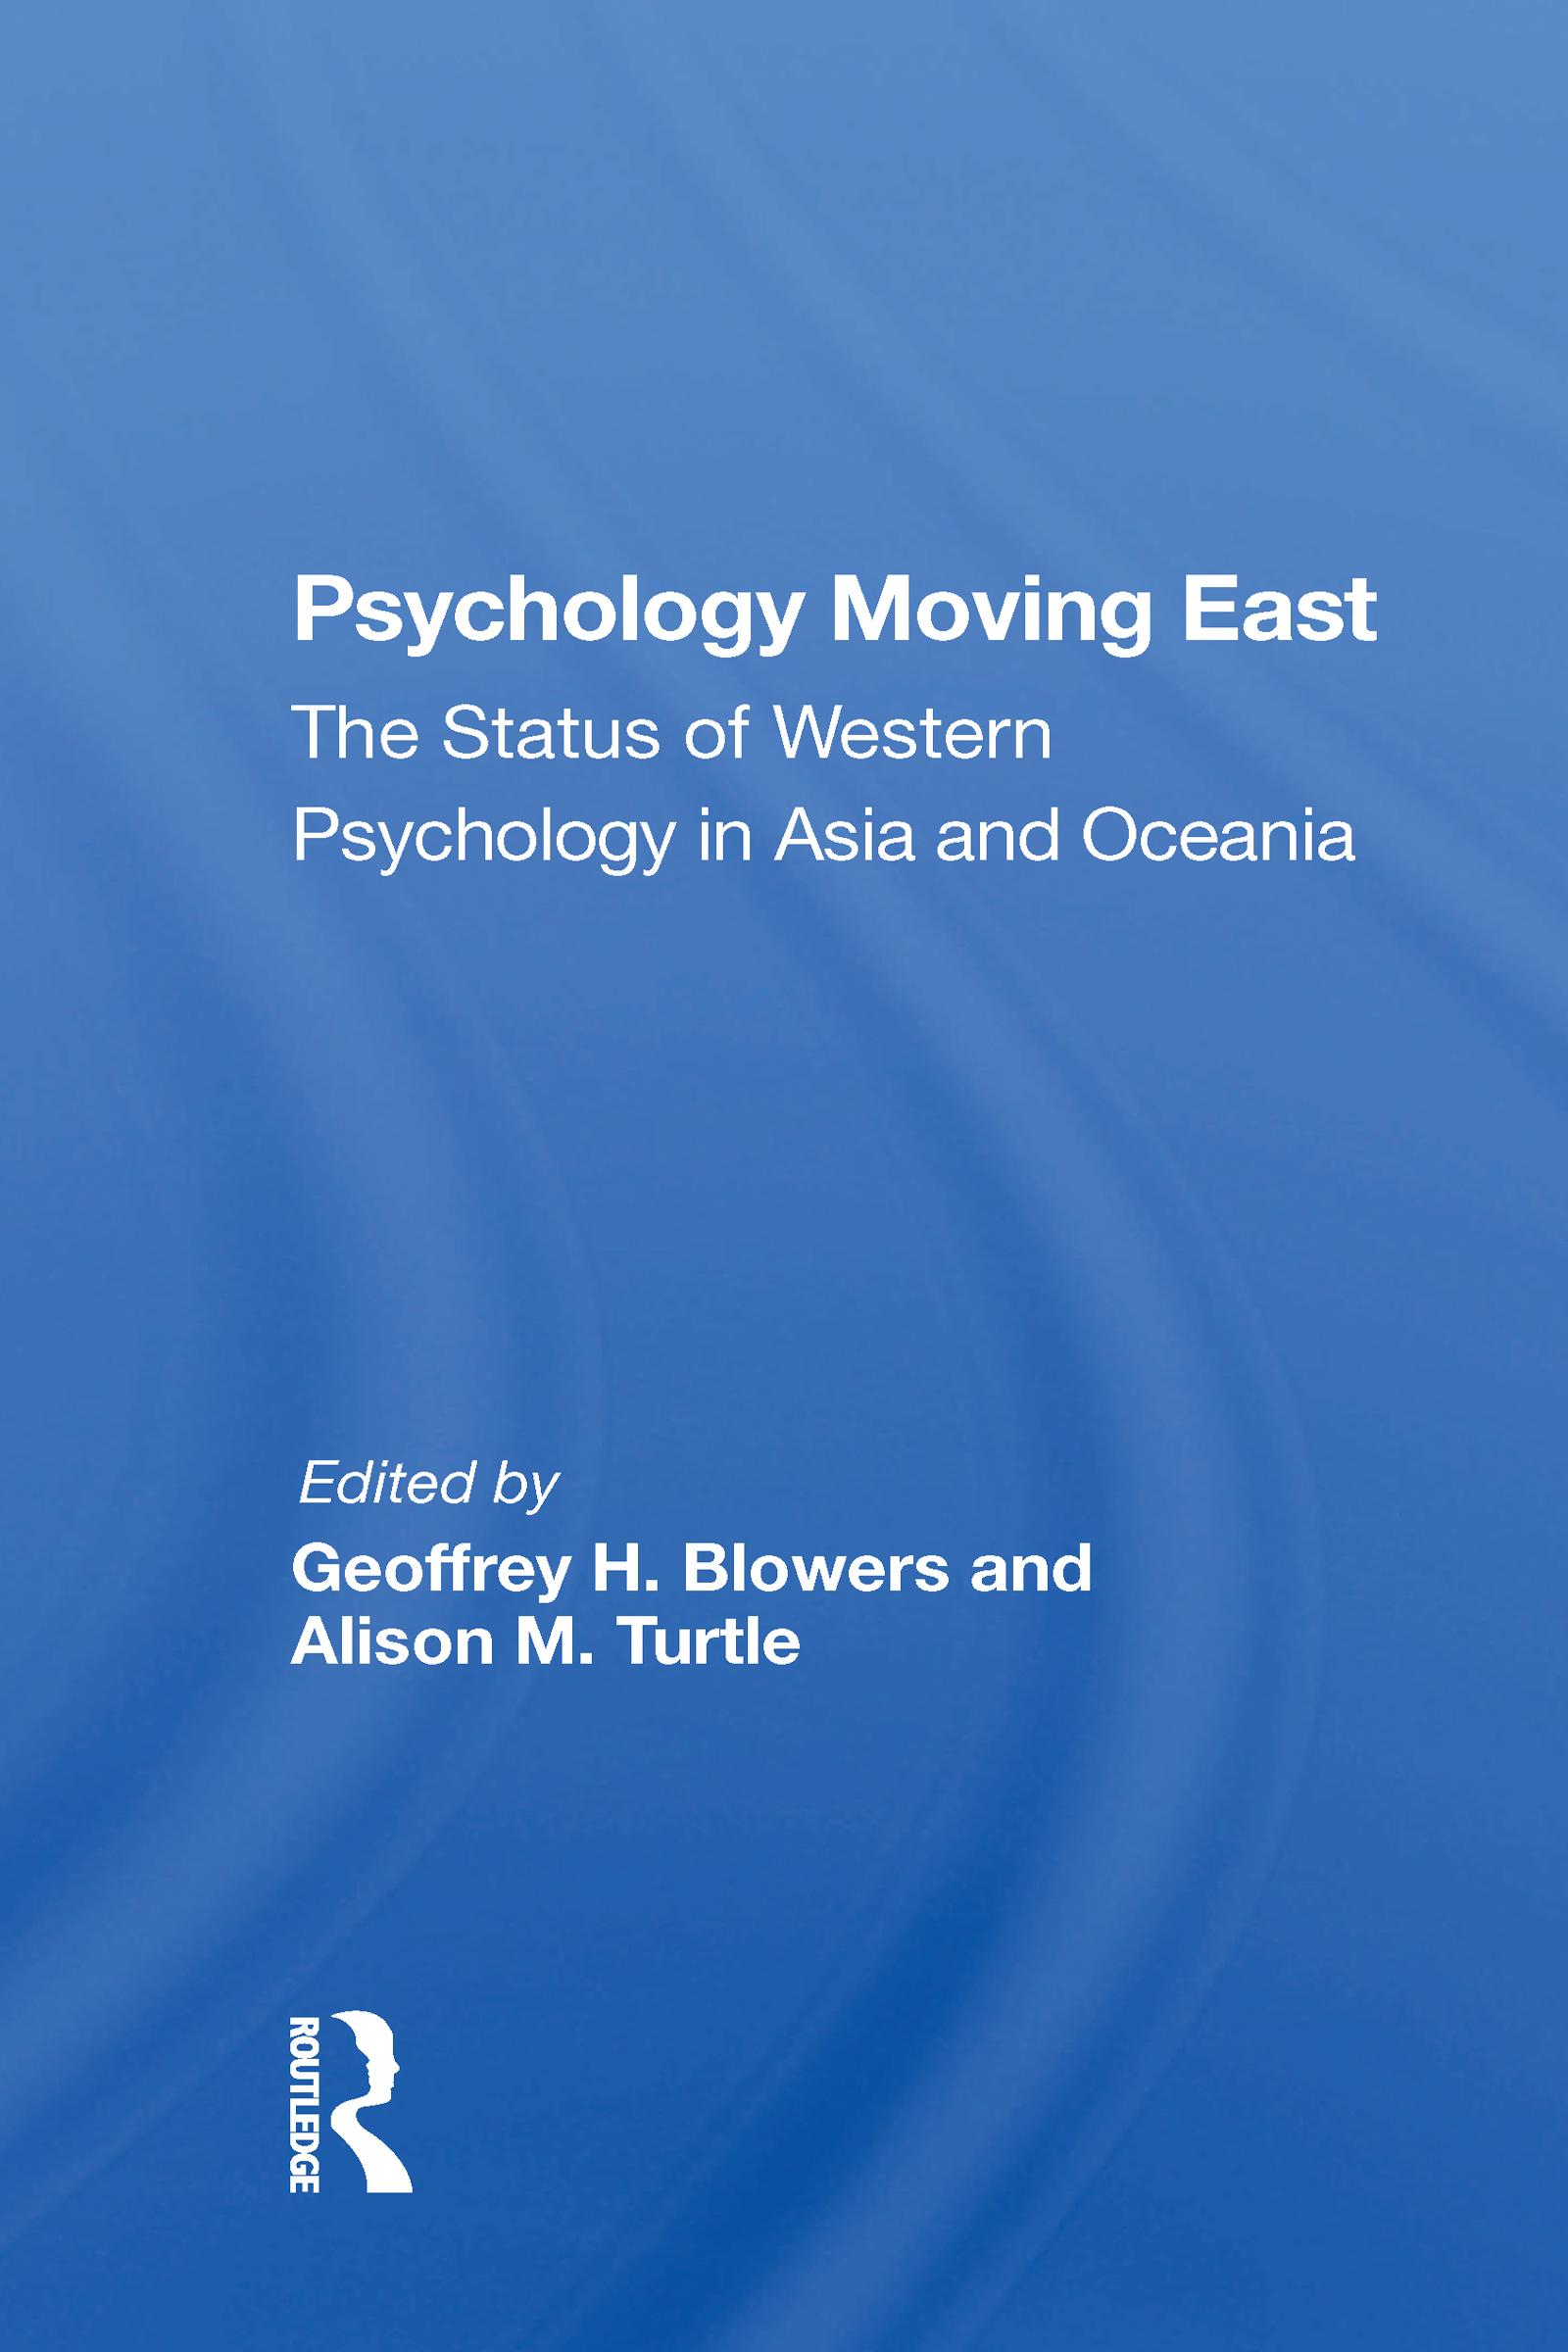 Psychology Moving East